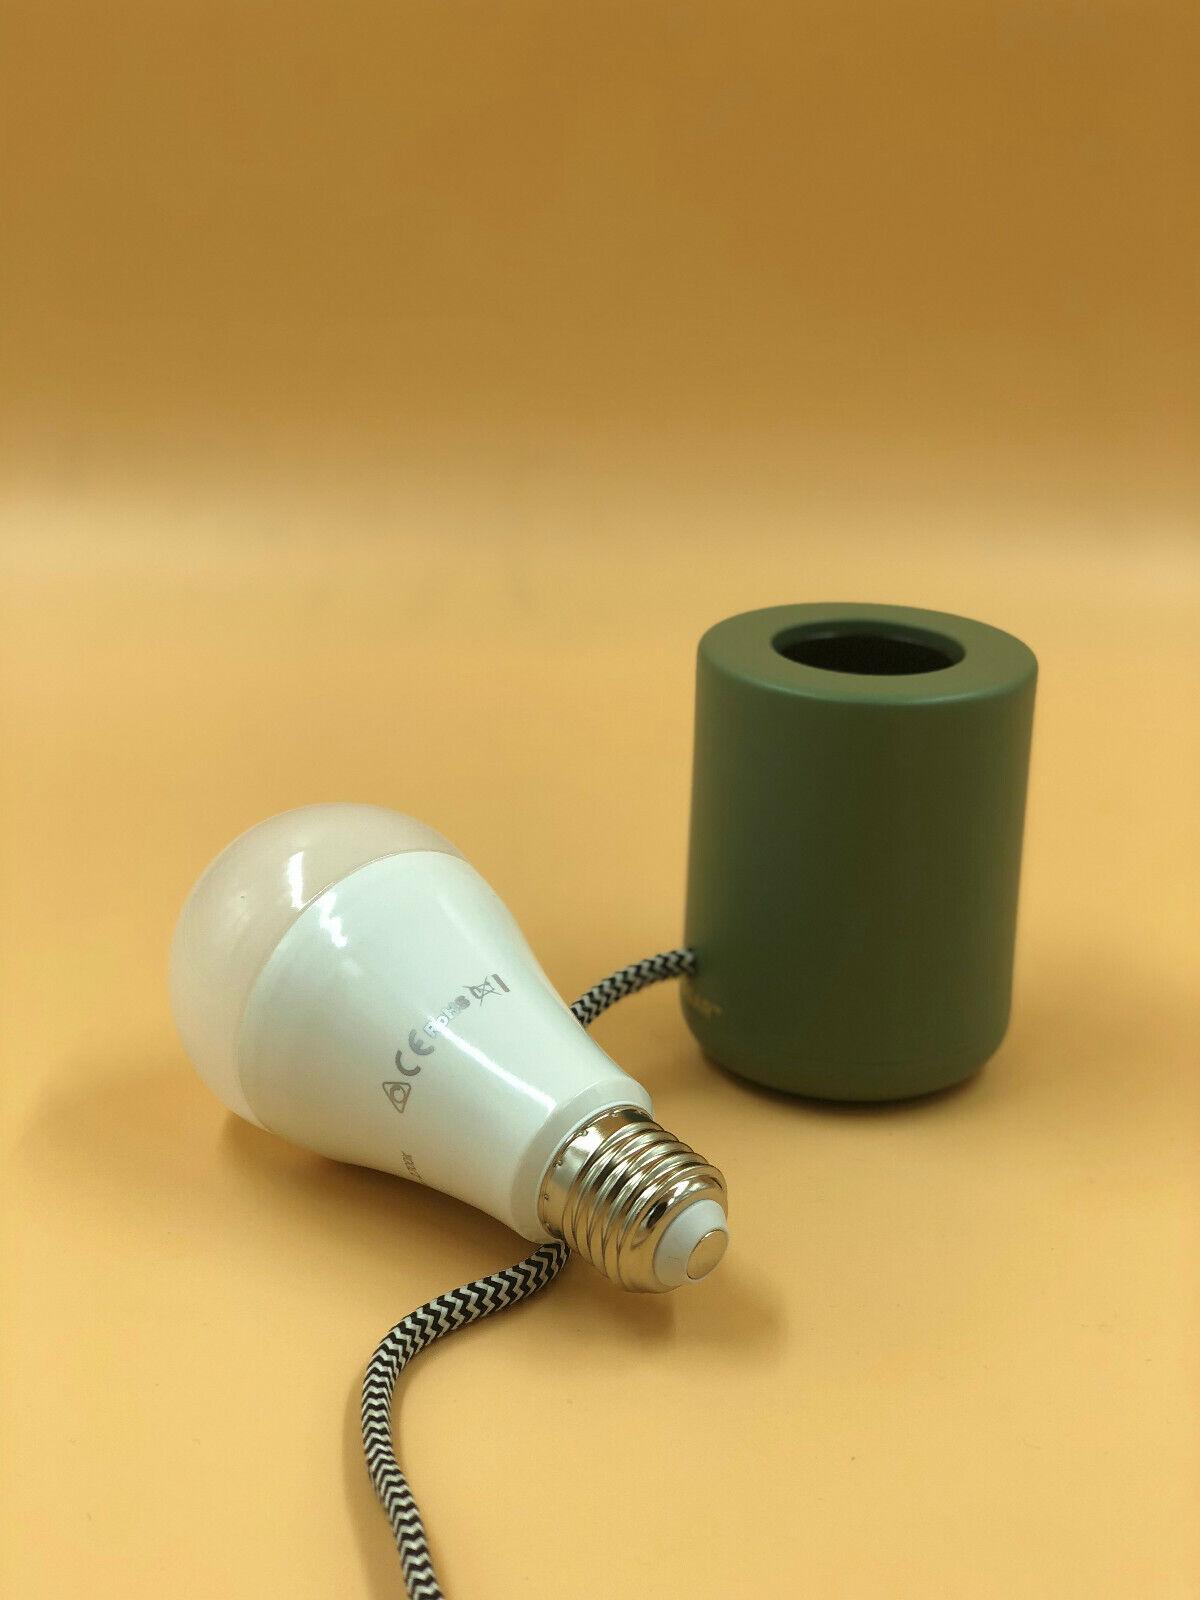 100 x LED AGL Glühlampen Master dimmbar